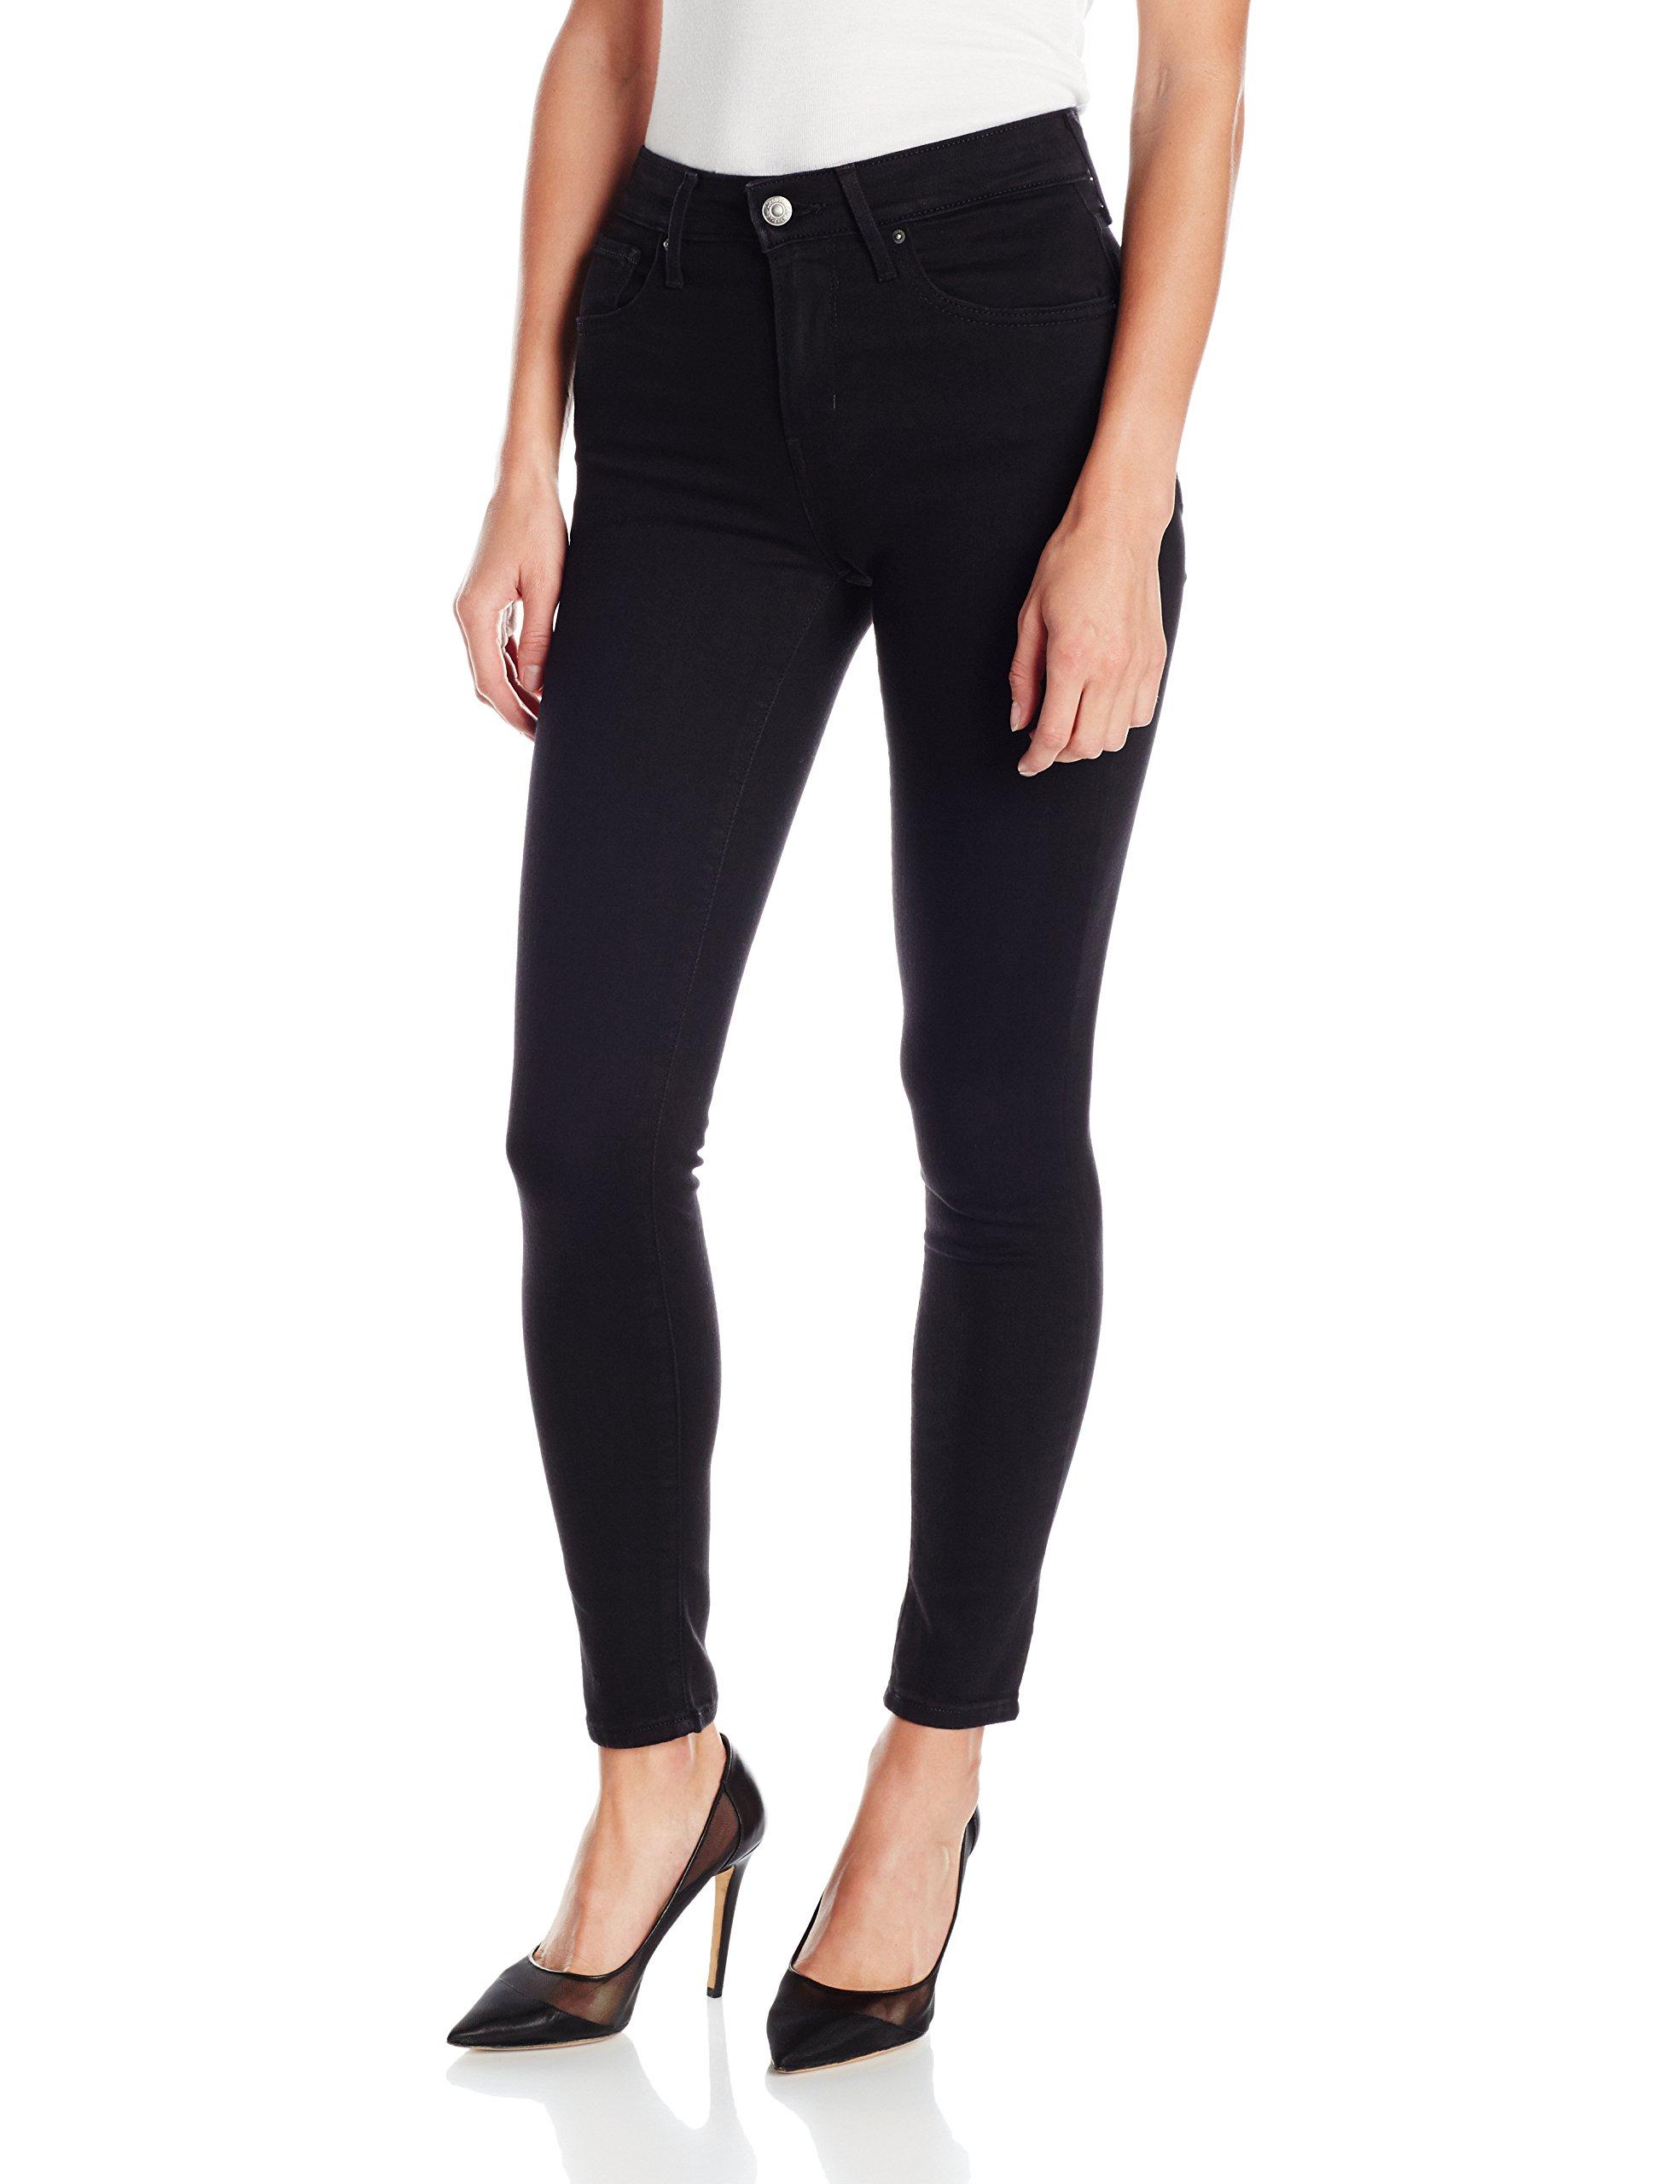 Levi's Women's 721 High Rise Skinny Jeans, Soft Black, 27 (US 4) R